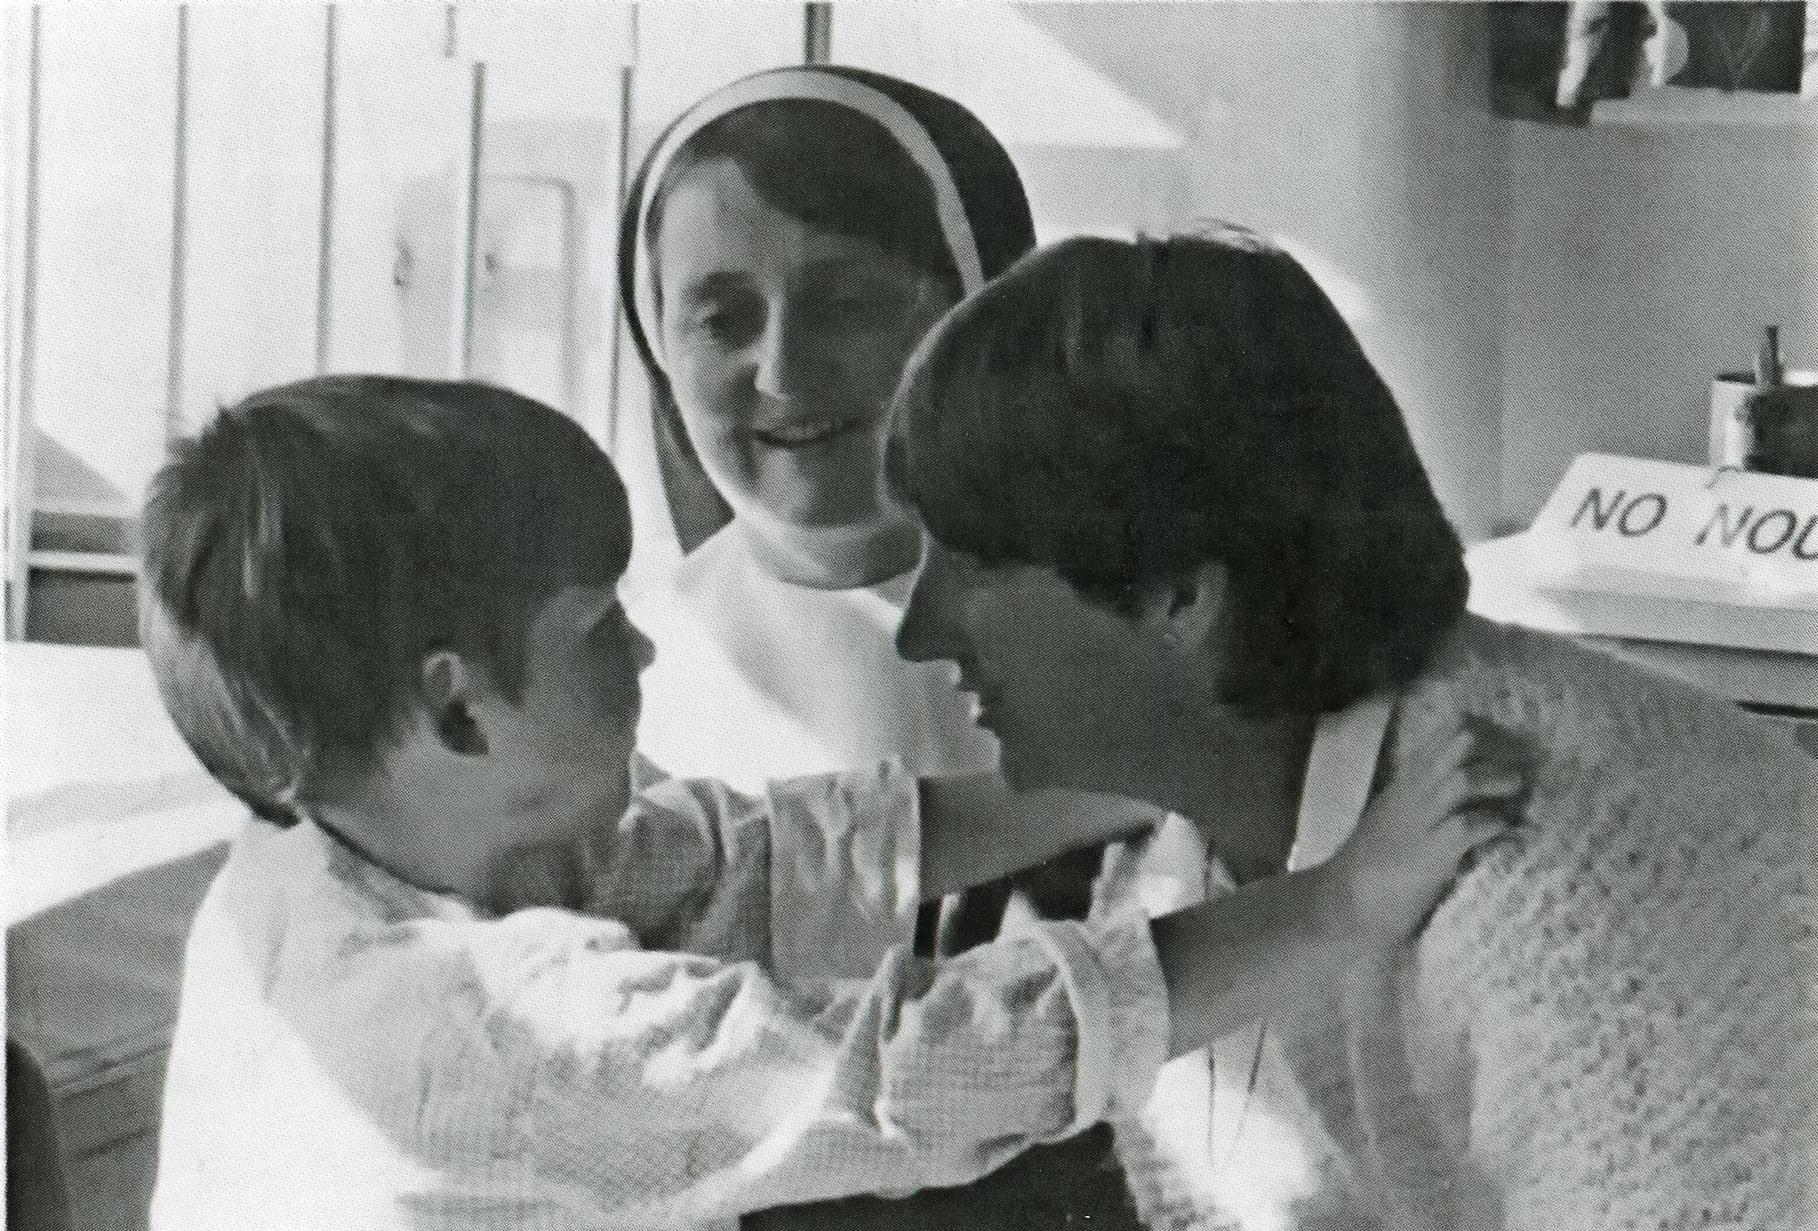 Sister Felicity at the Royal Children's Hospital.